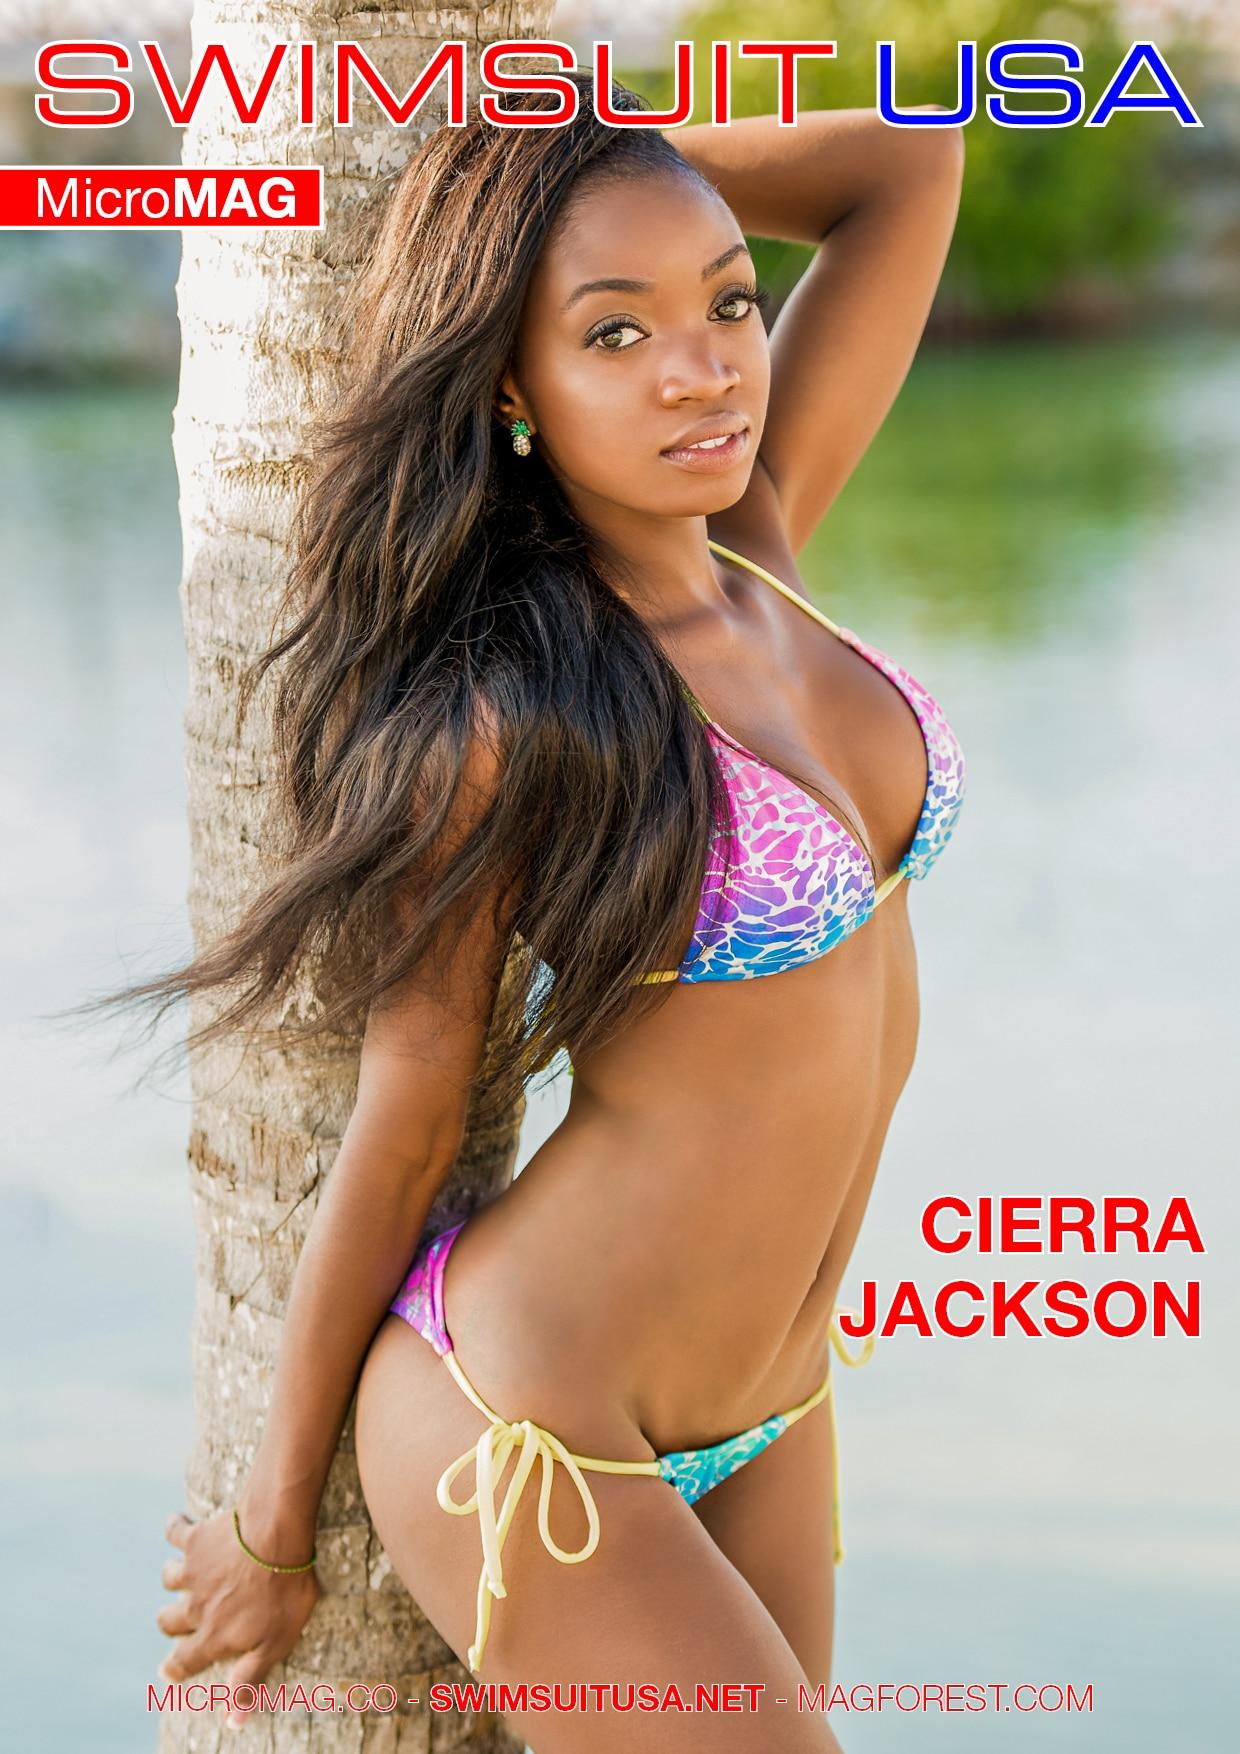 Swimsuit Usa Micromag – Cierra Jackson – Issue 1